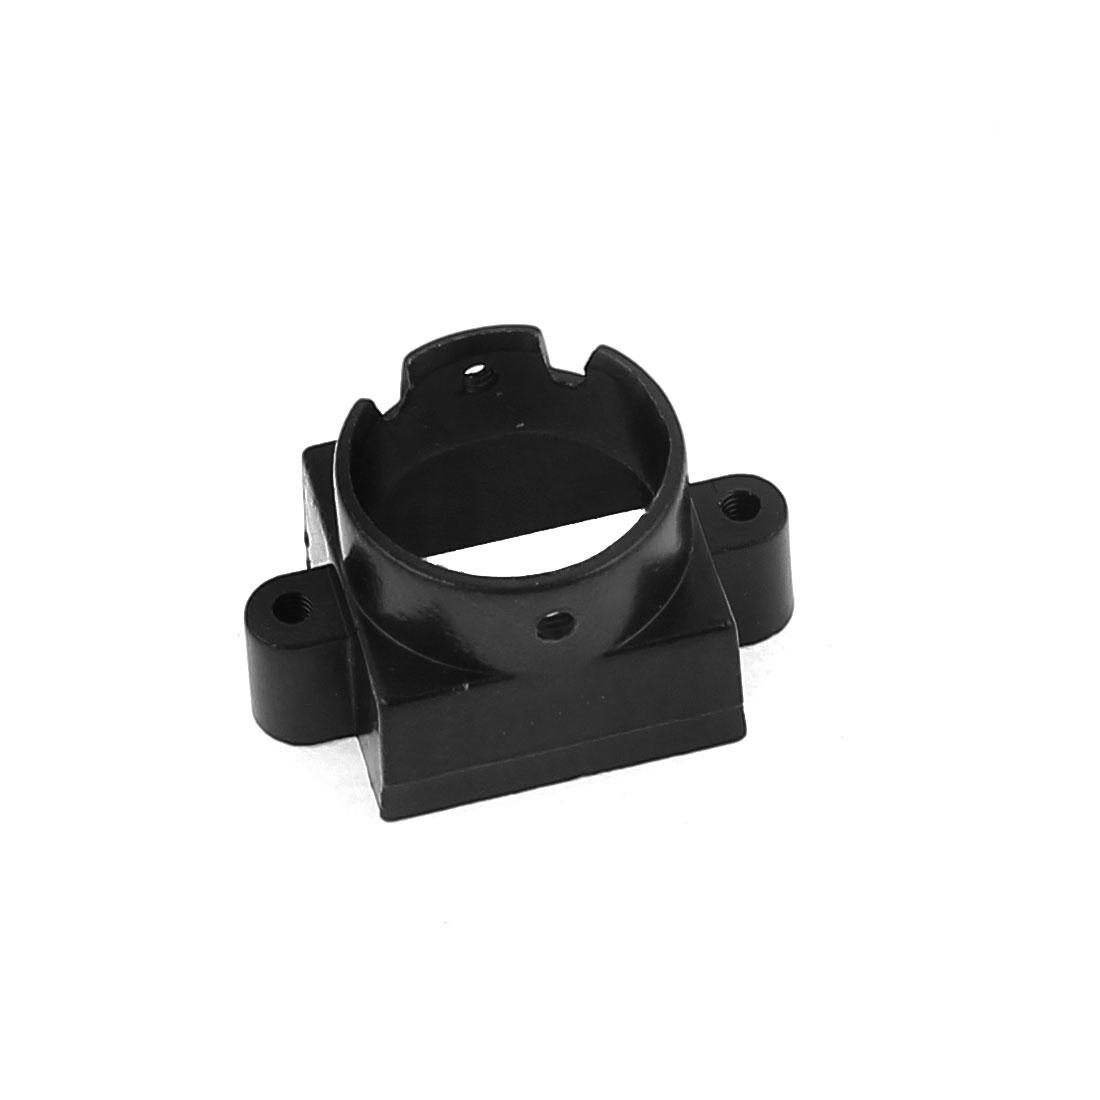 Black Metal HD52 M12 CCTV Camera CCD Lens Mount Holder 22mm Spacing